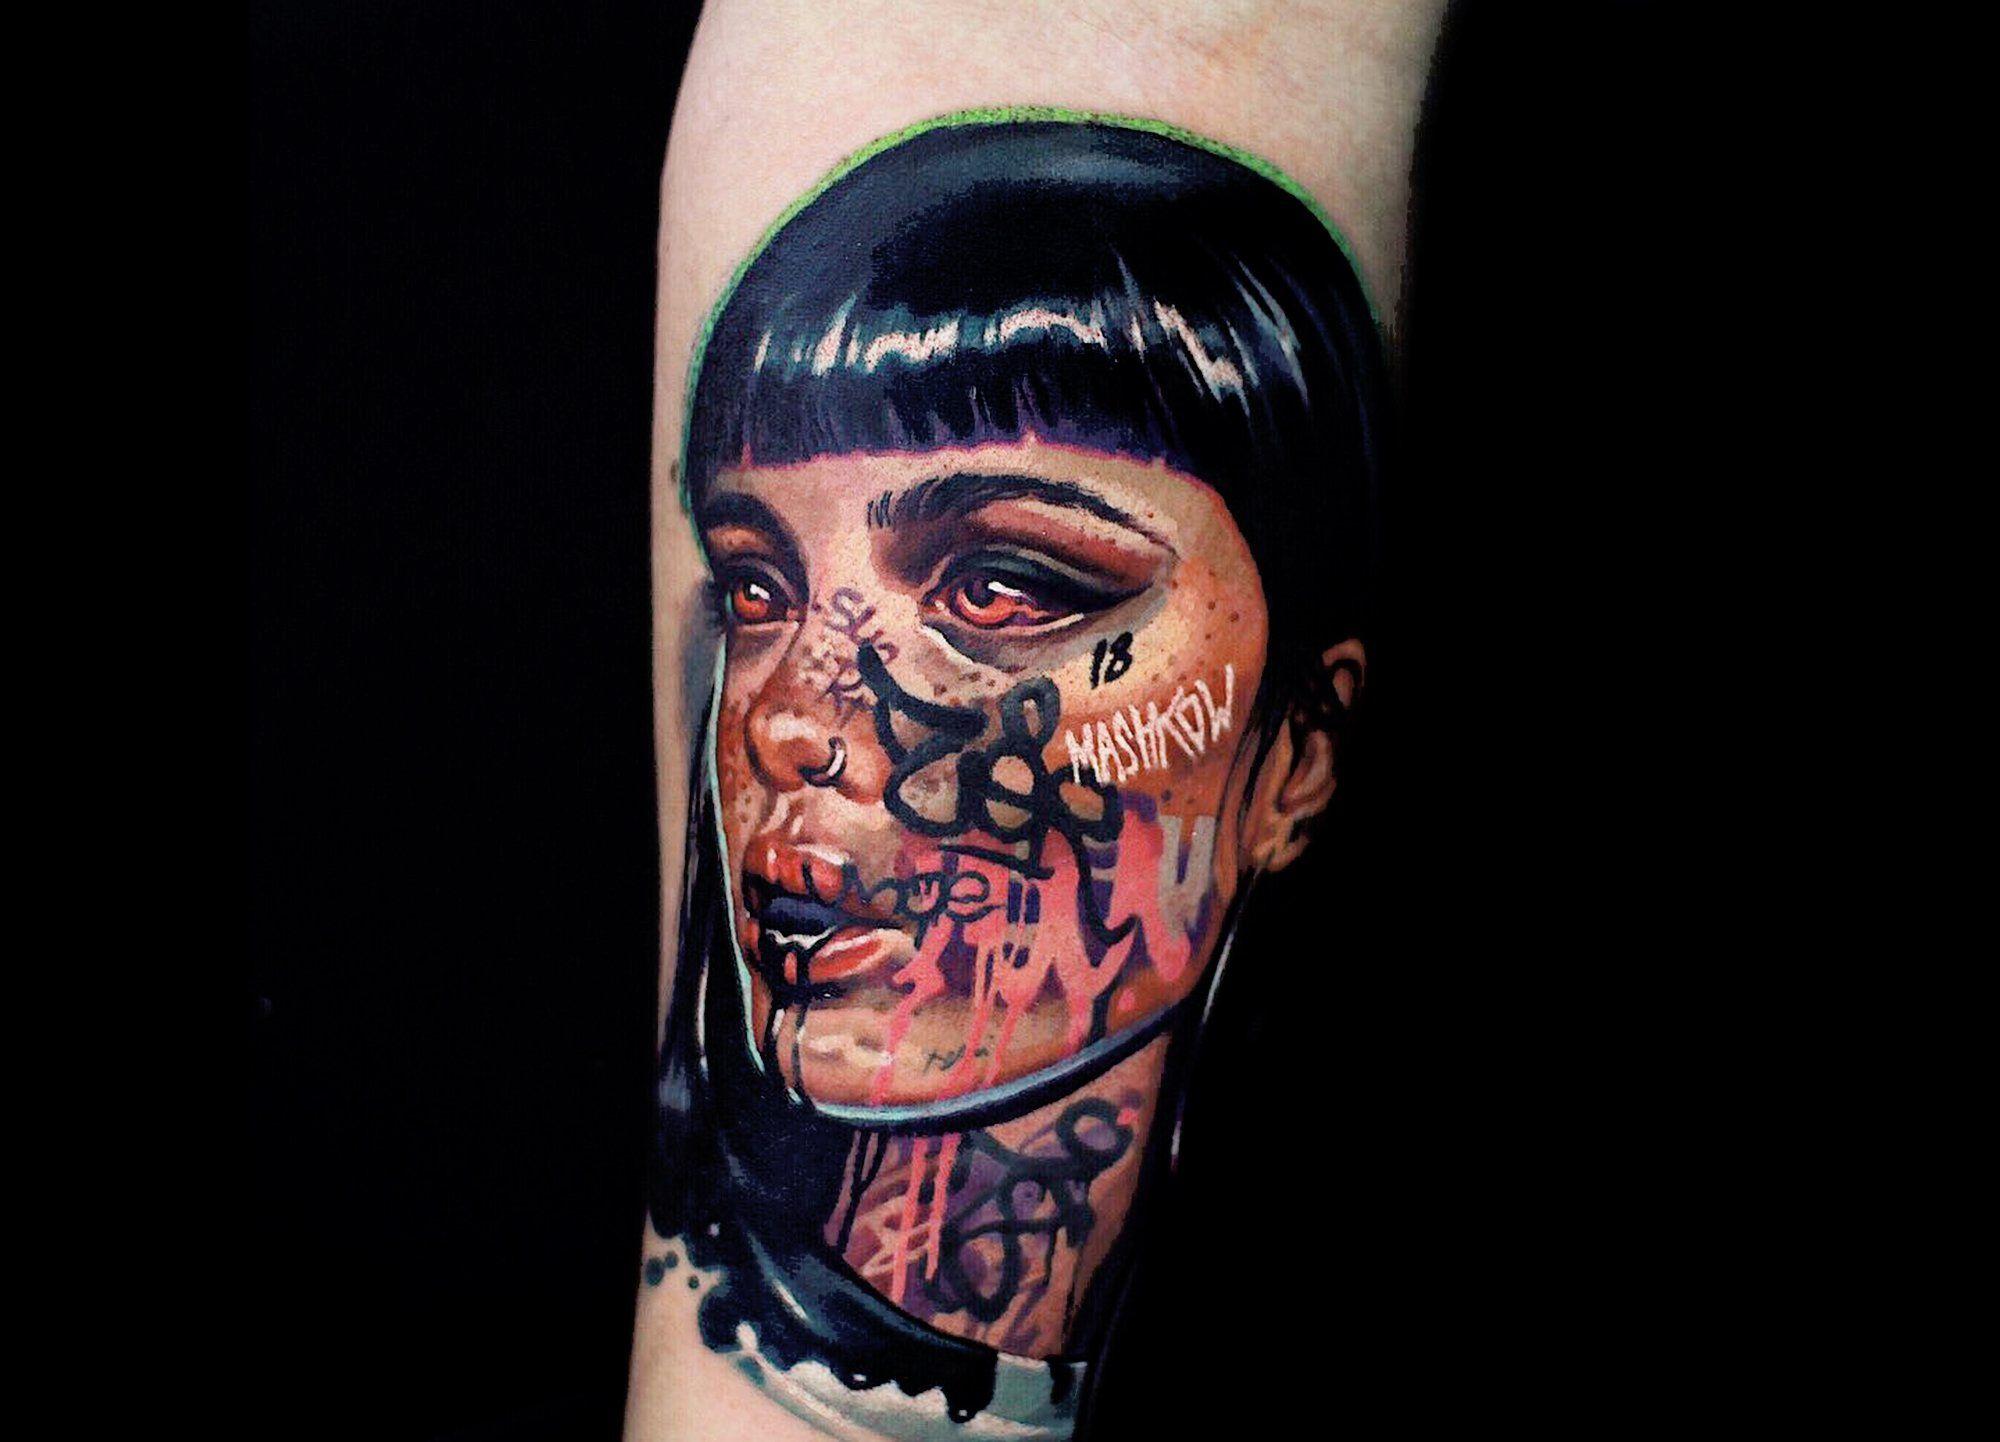 Graffiti bombed faces tattoos by mashkow graffiti face